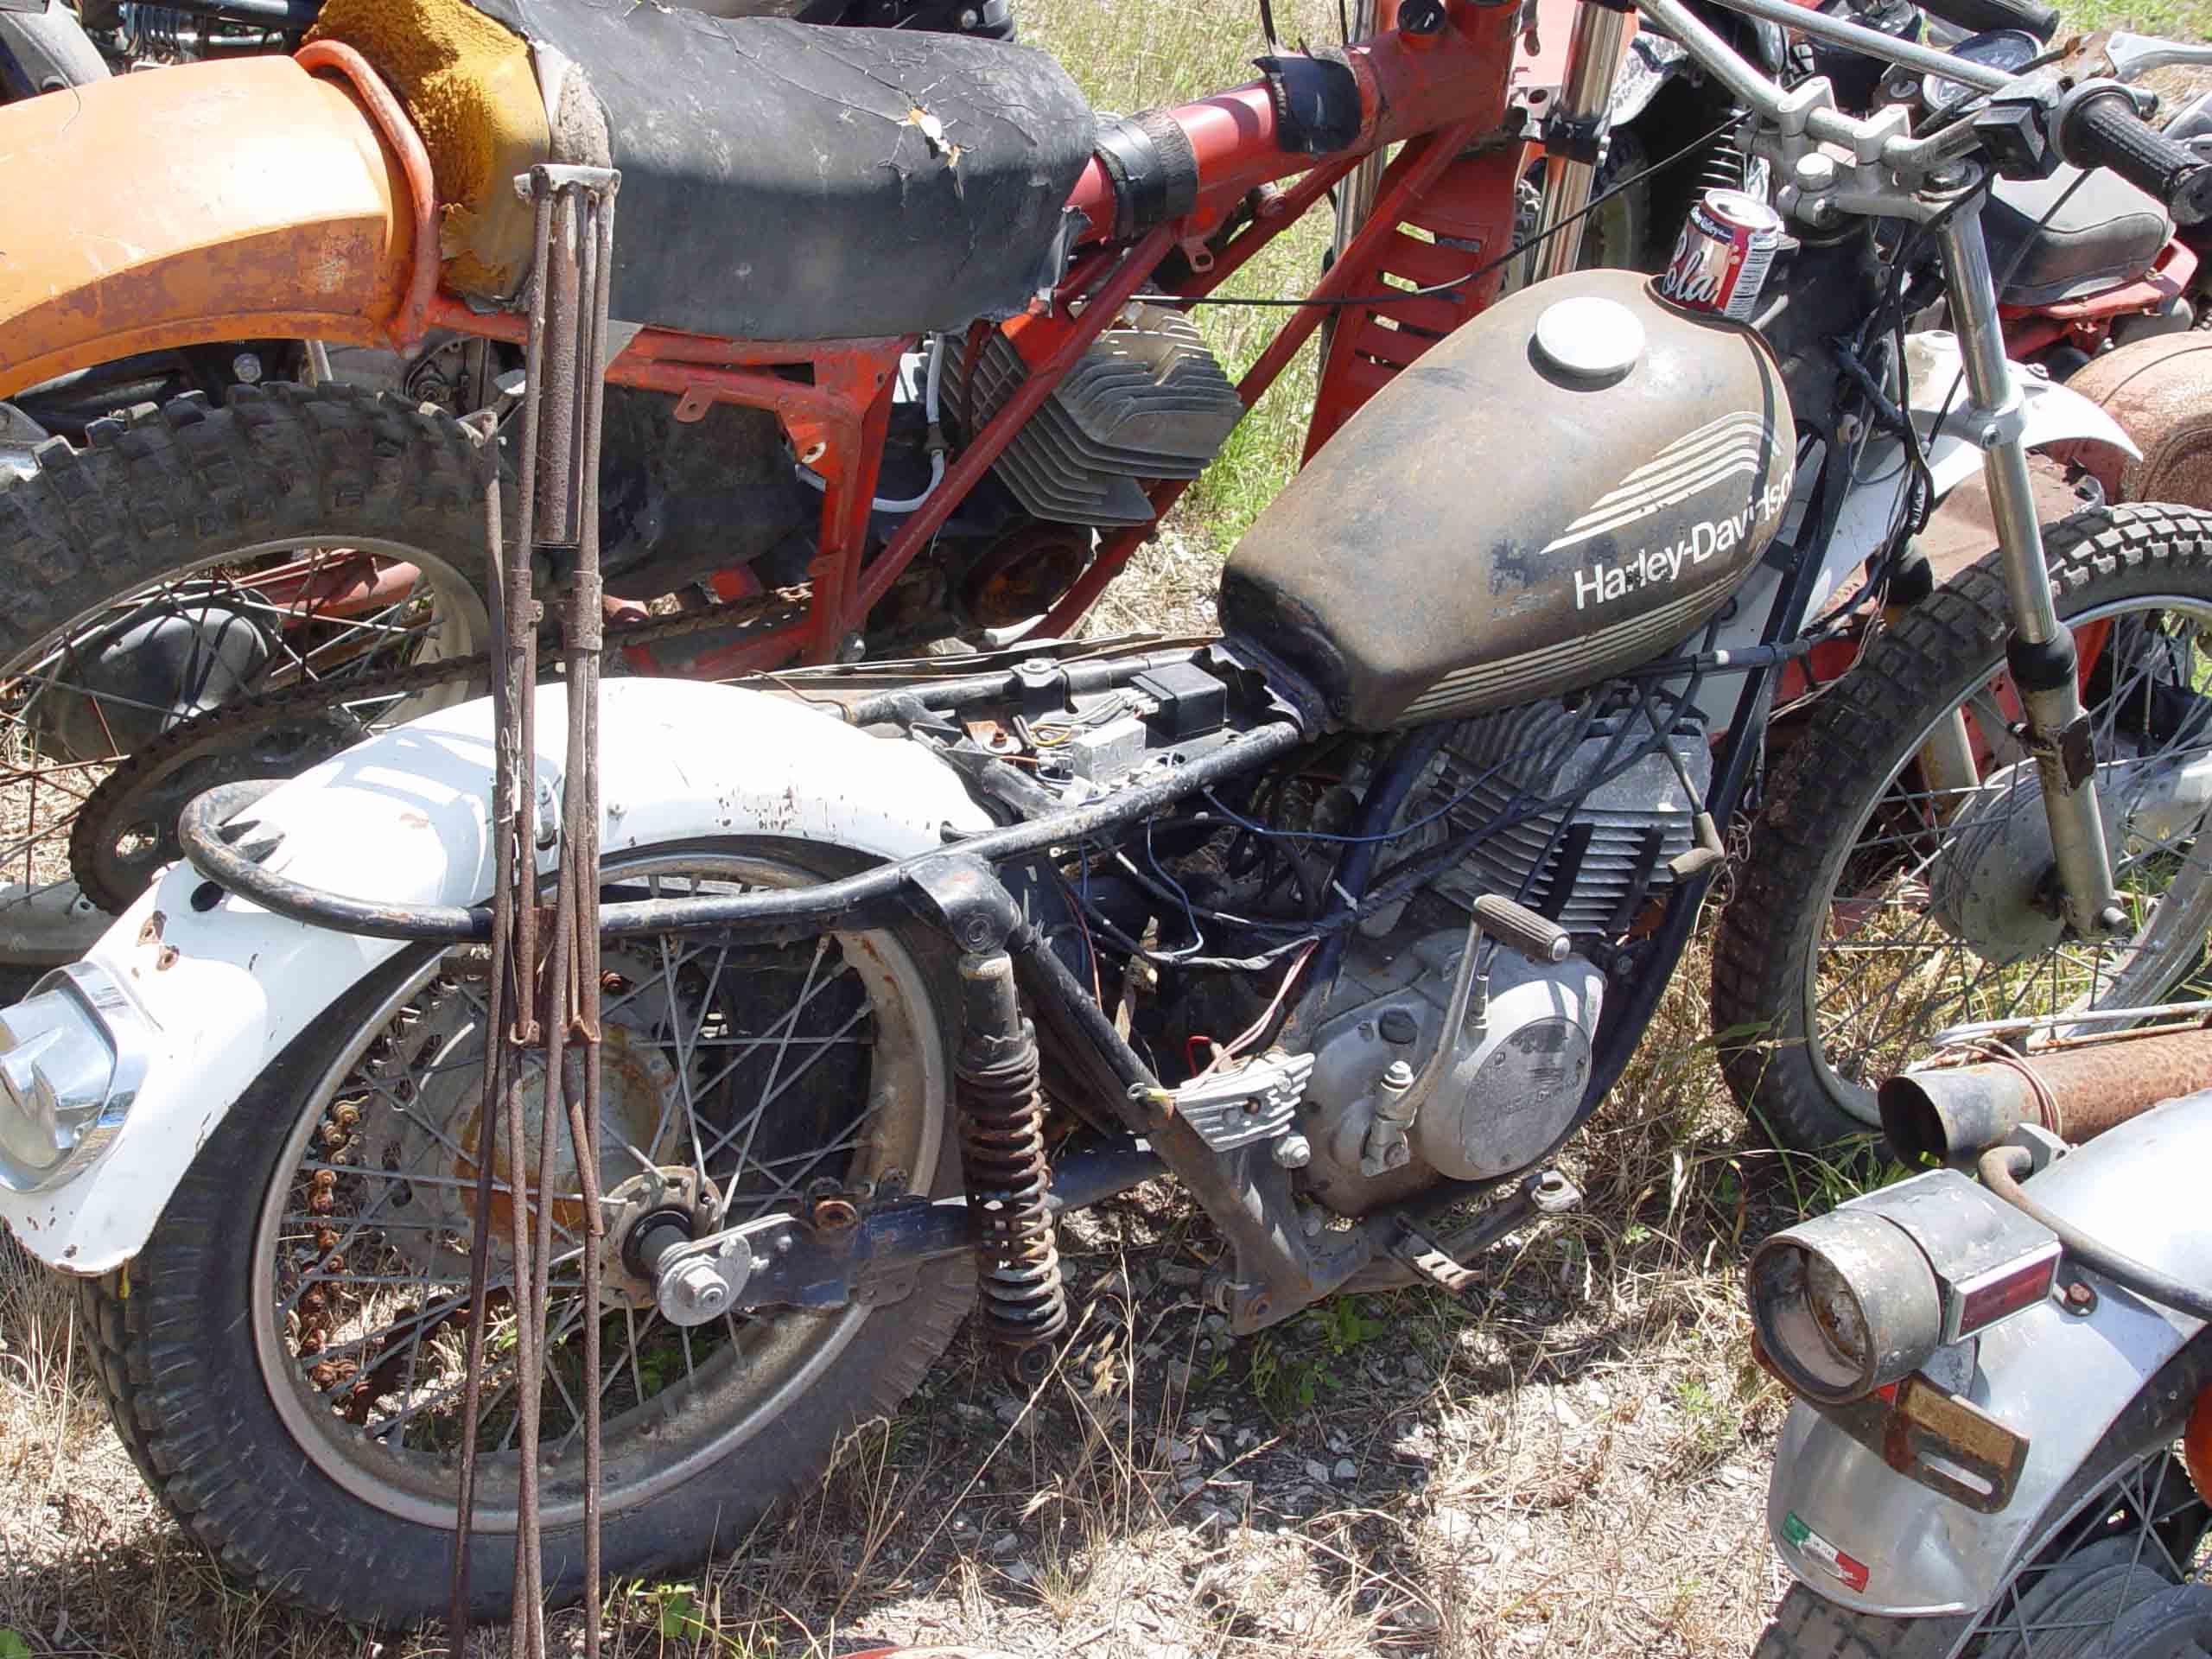 RKP Enterprises Auction: Harley Davidson Bikes and Parts Gallery